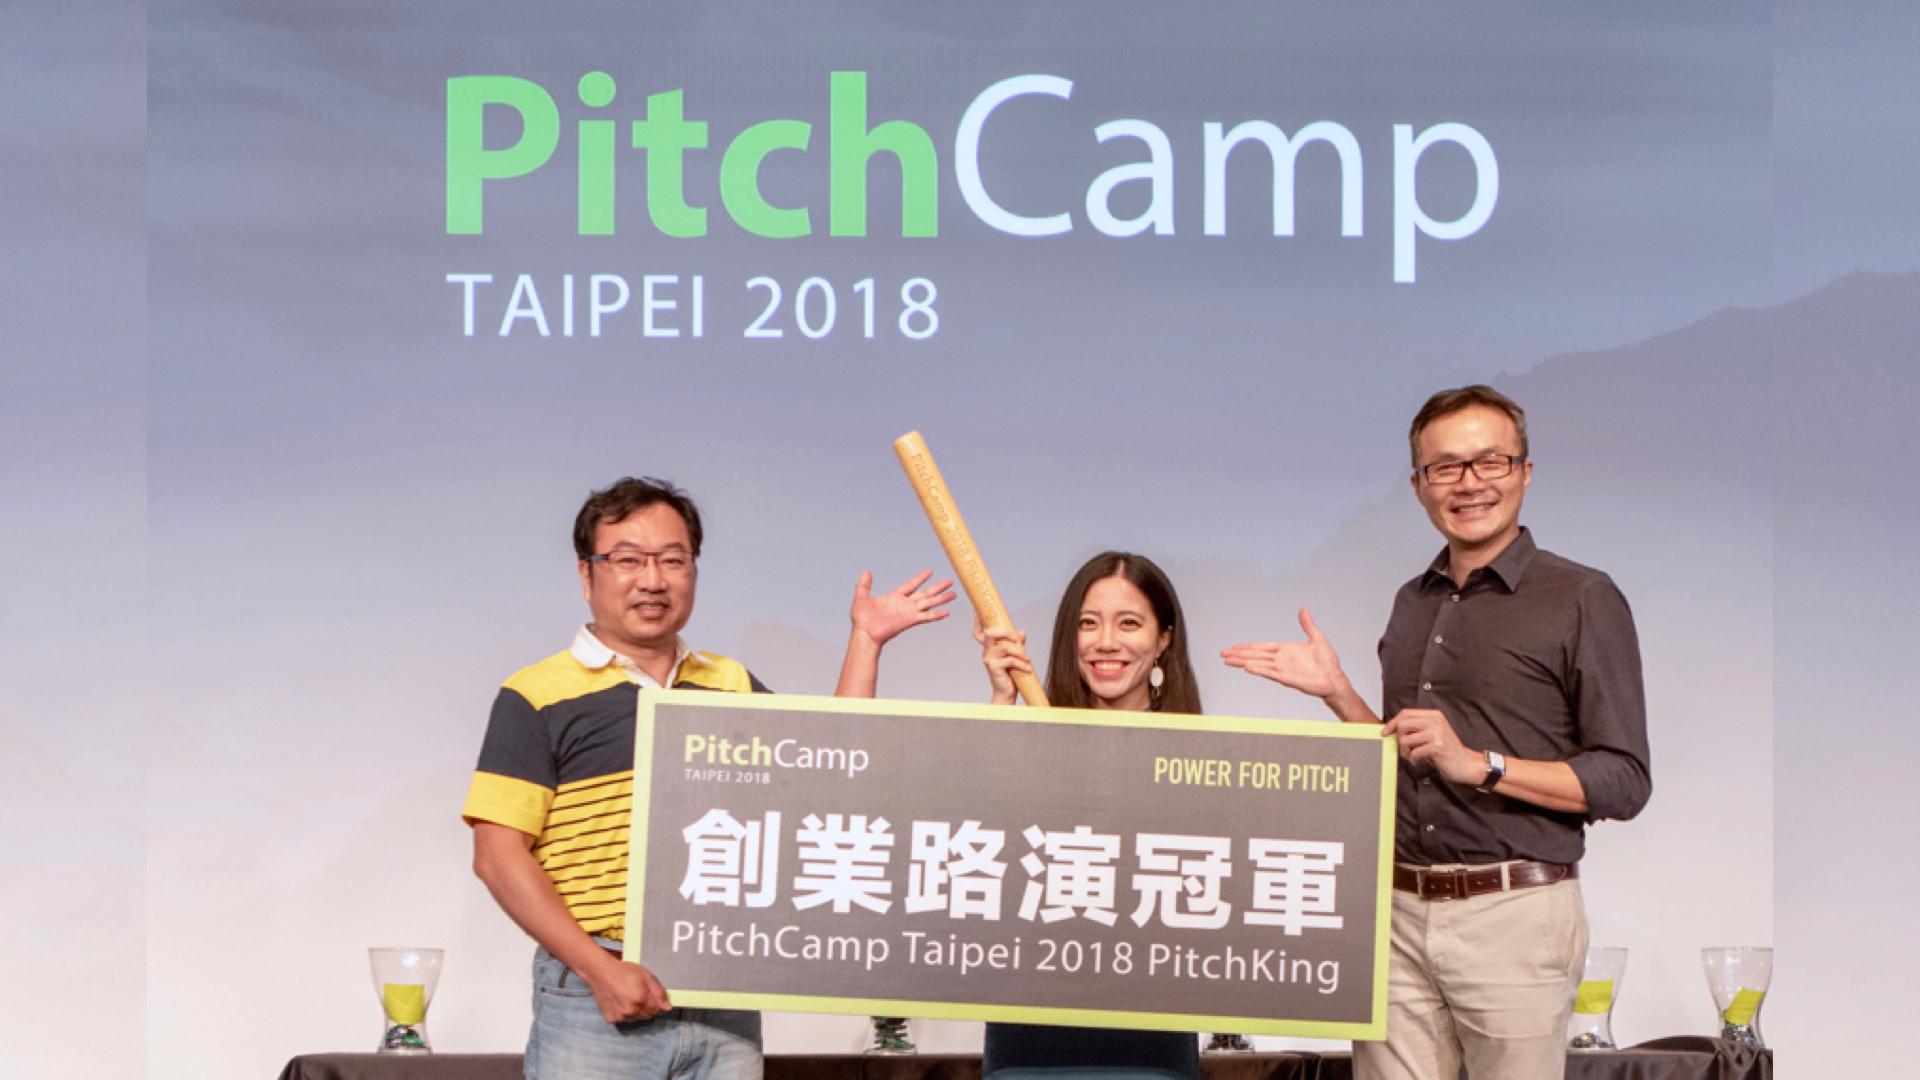 PitchCamp 2018 臺灣創業路演巔峰對決順利落幕 — BFA 簡報